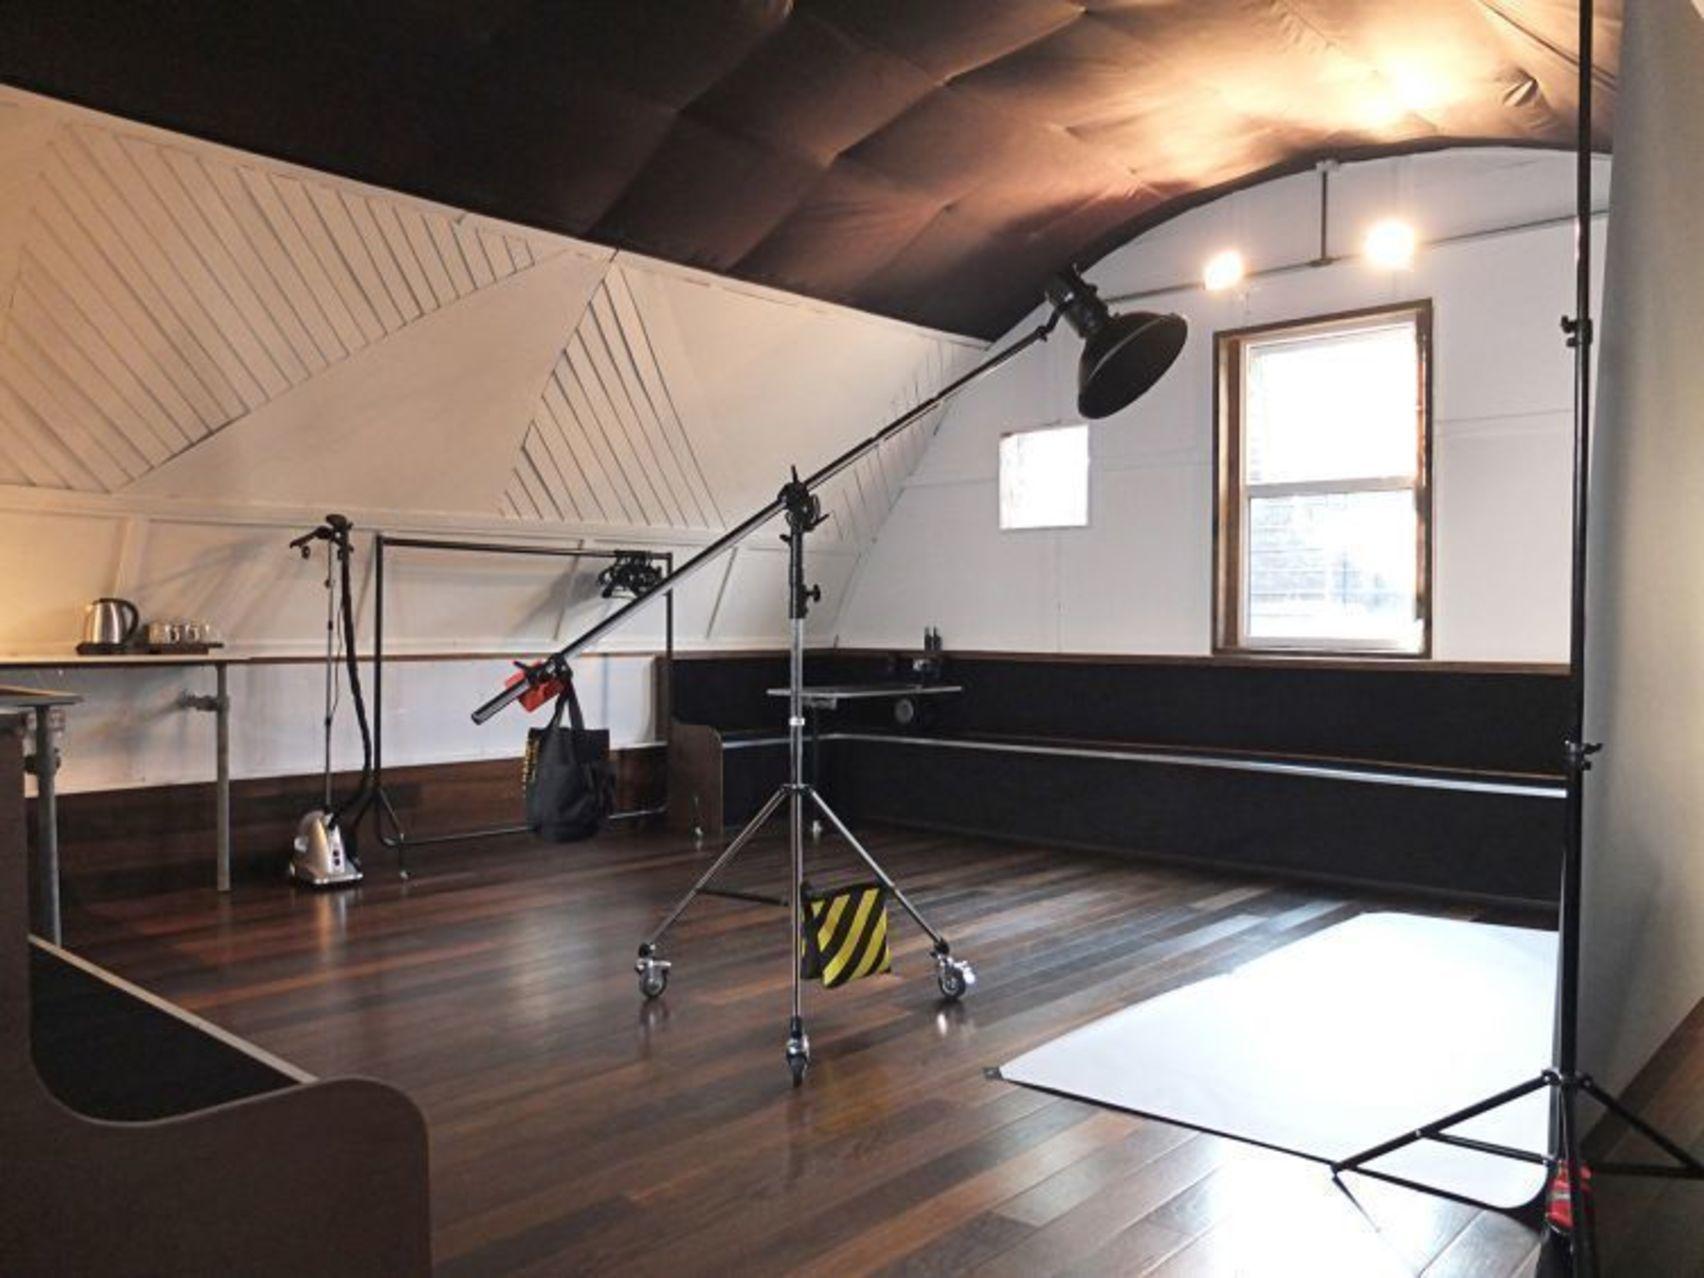 Studio Two - Professional Photographic Studio Hire, Simulacra Studio